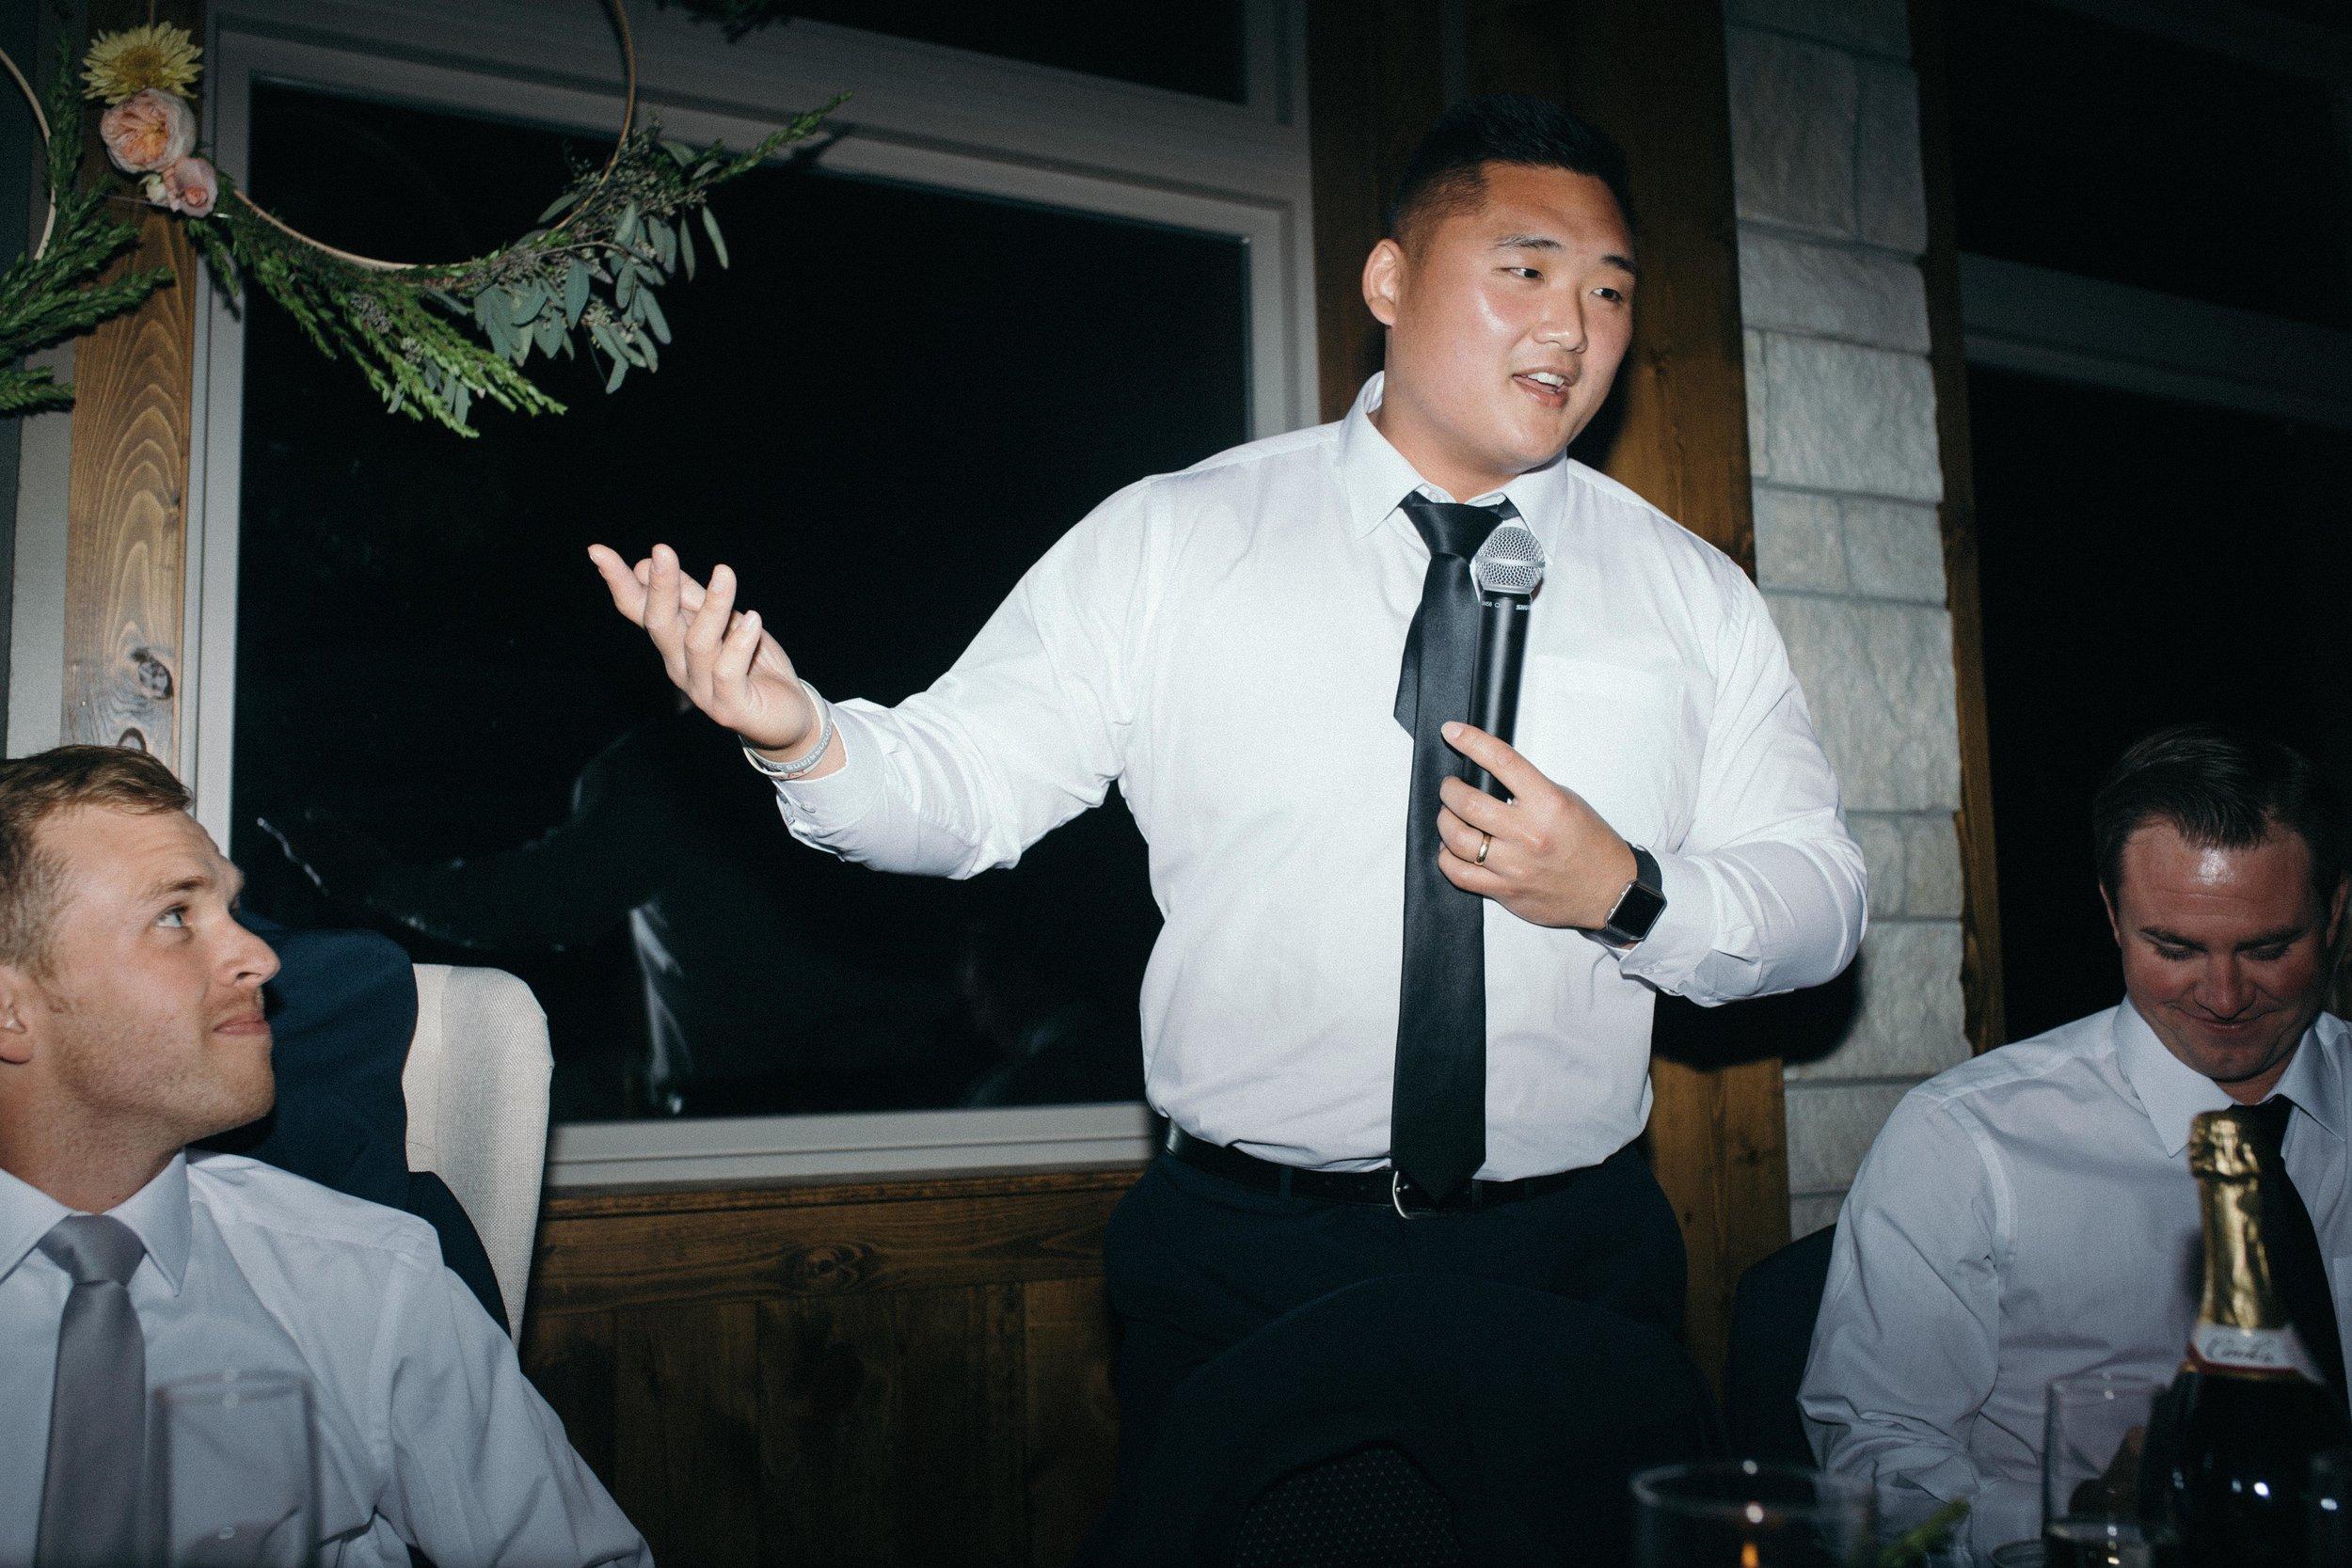 bailey-jared-wedding-blog-112.jpg